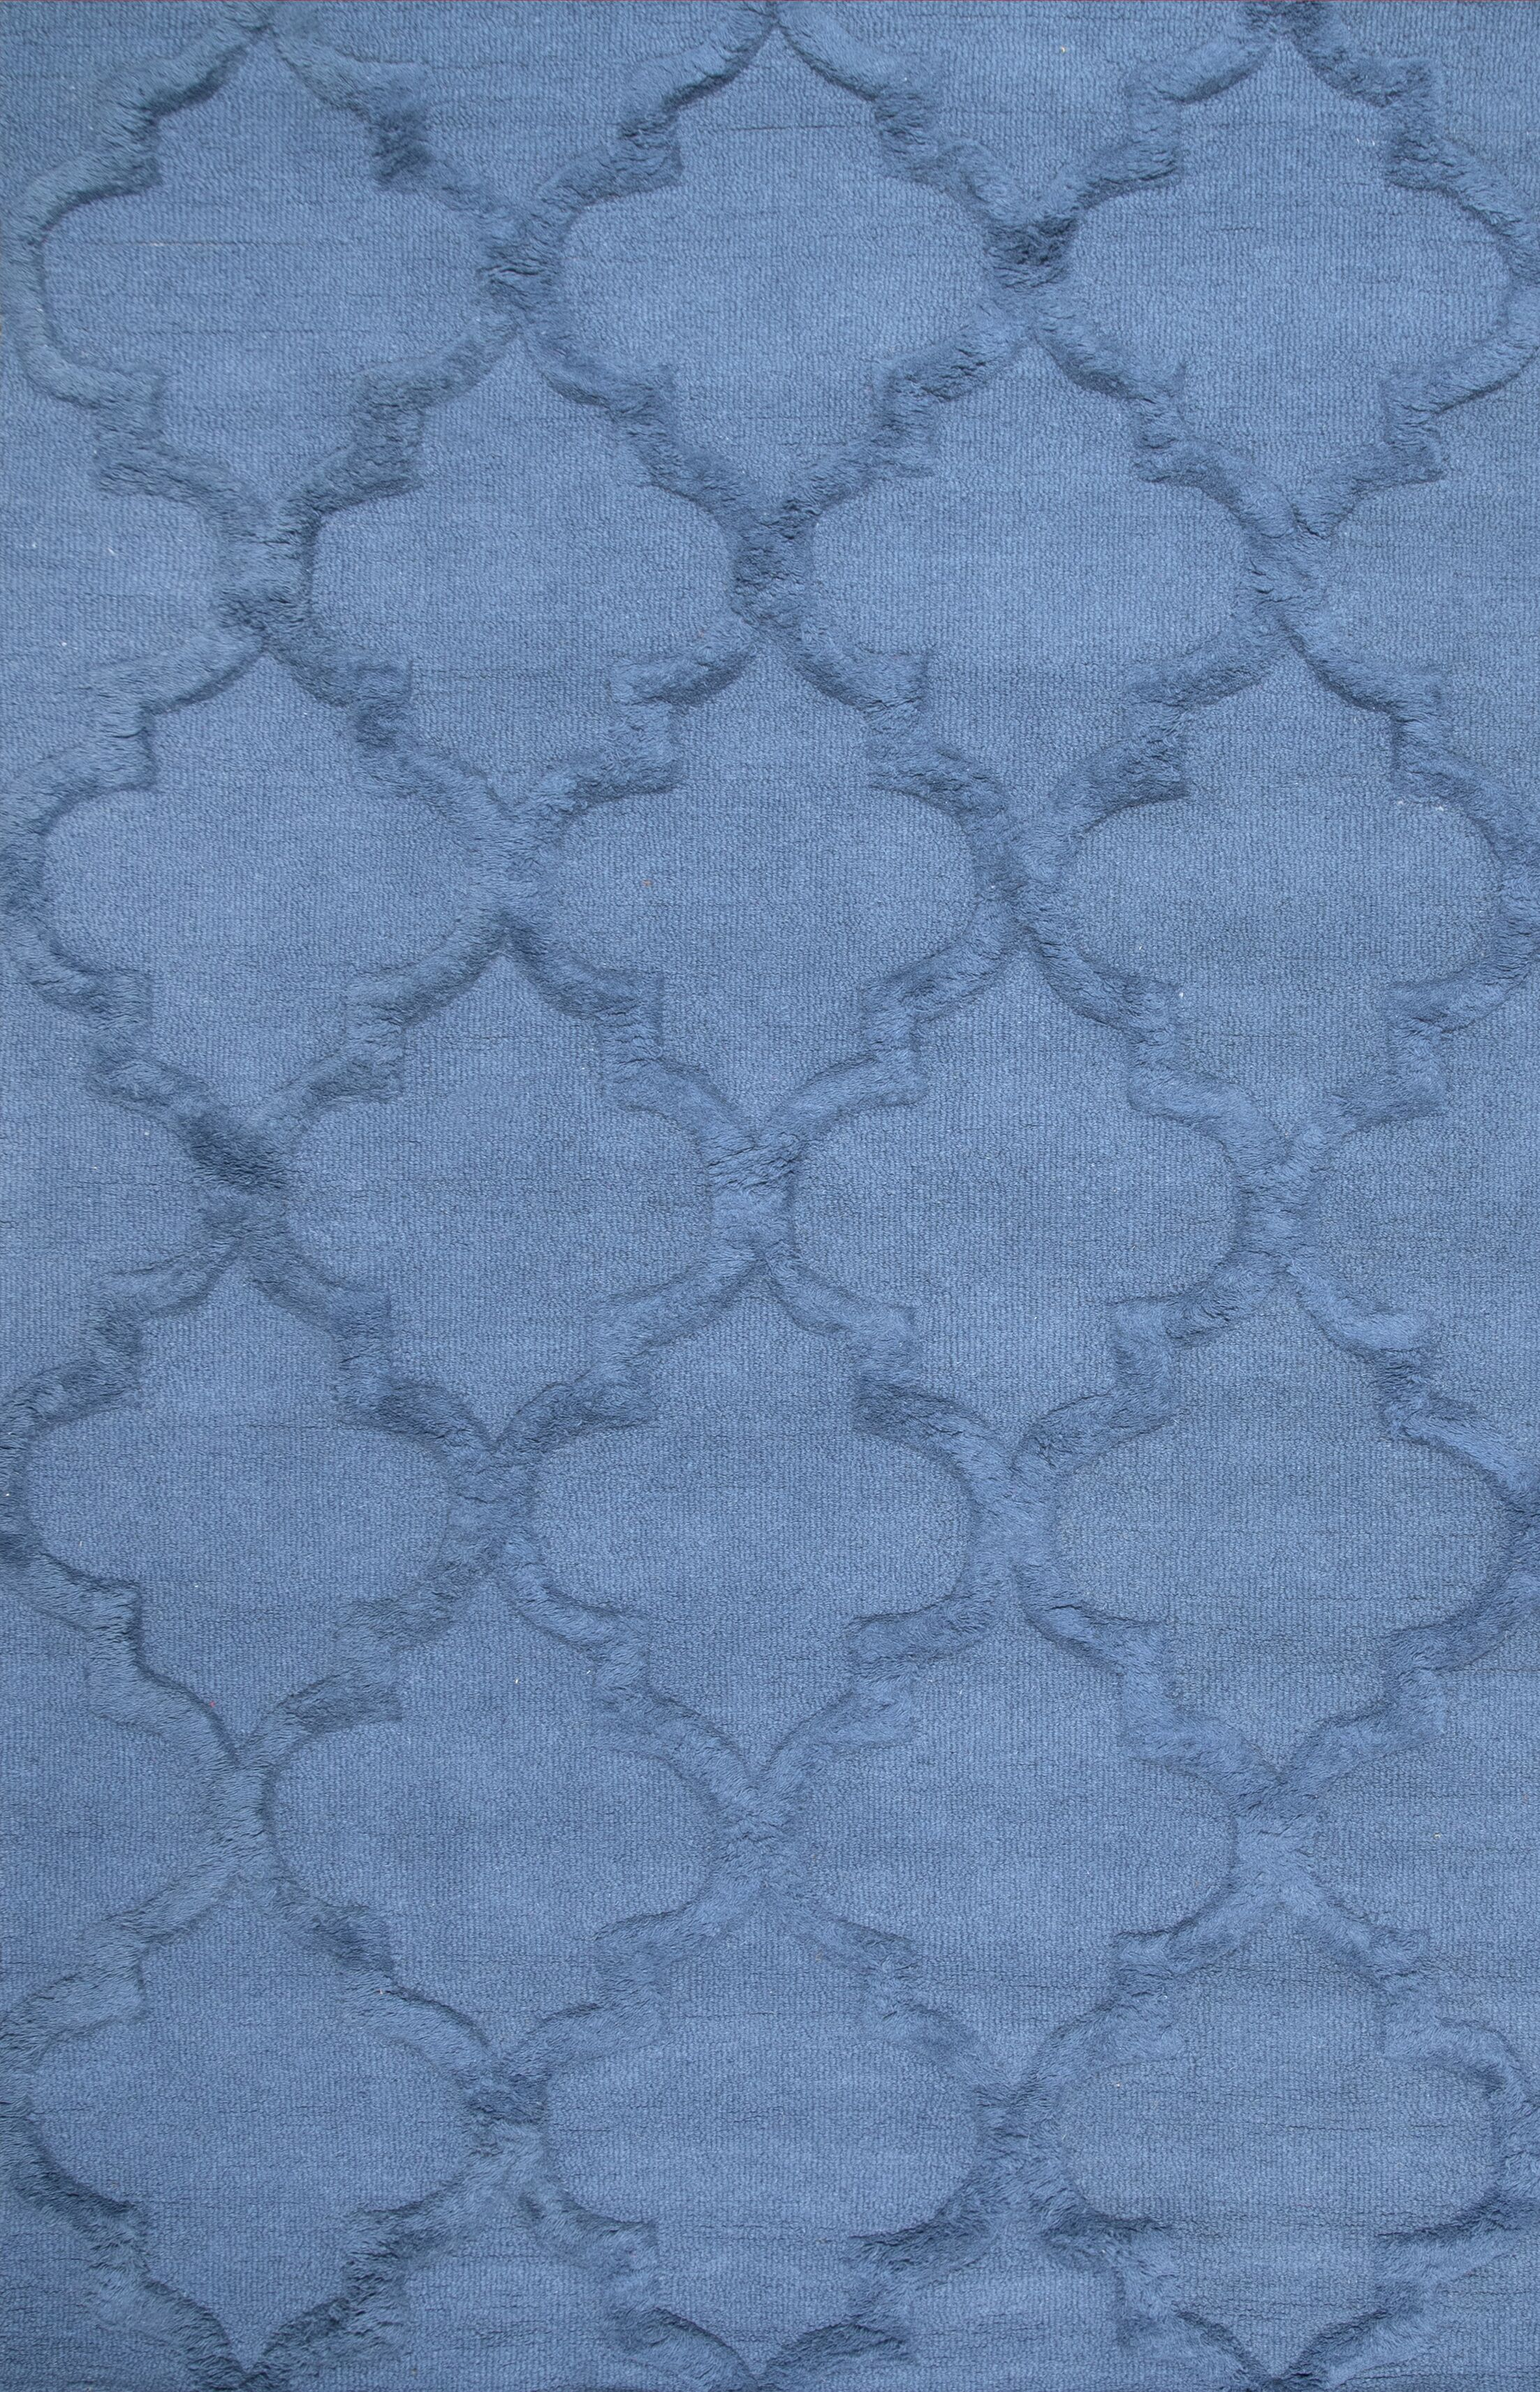 Koshney Hand-Tufted Denim Area Rug Rug Size: Rectangle 5' x 8'